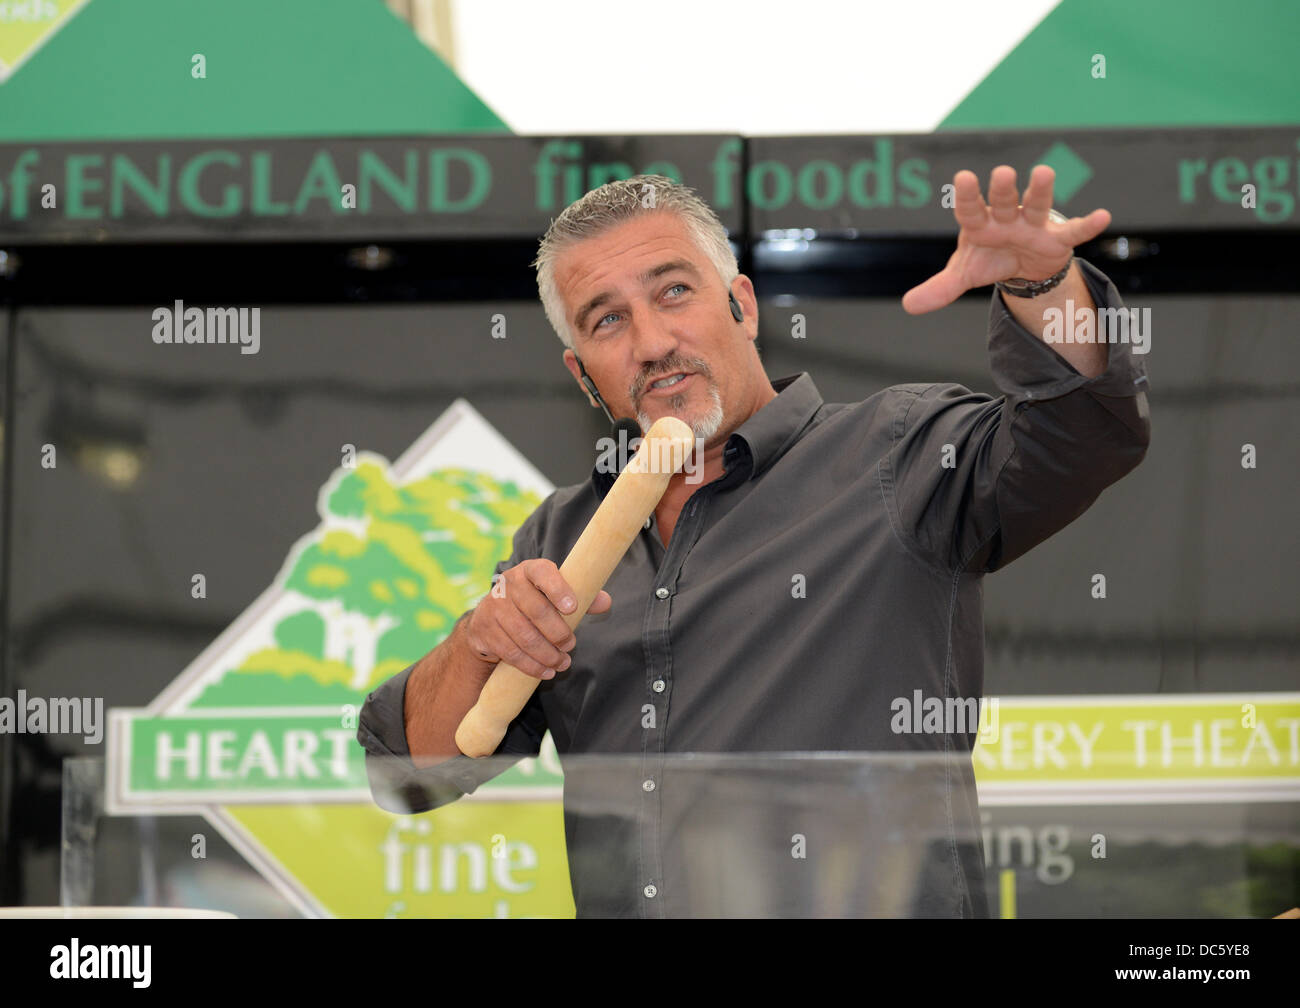 Shrewsbury Flower Show Uk 9. August 2013. TV Promi Bäcker Paul Hollywood zeigt seine Backen. Bildnachweis: Stockbild